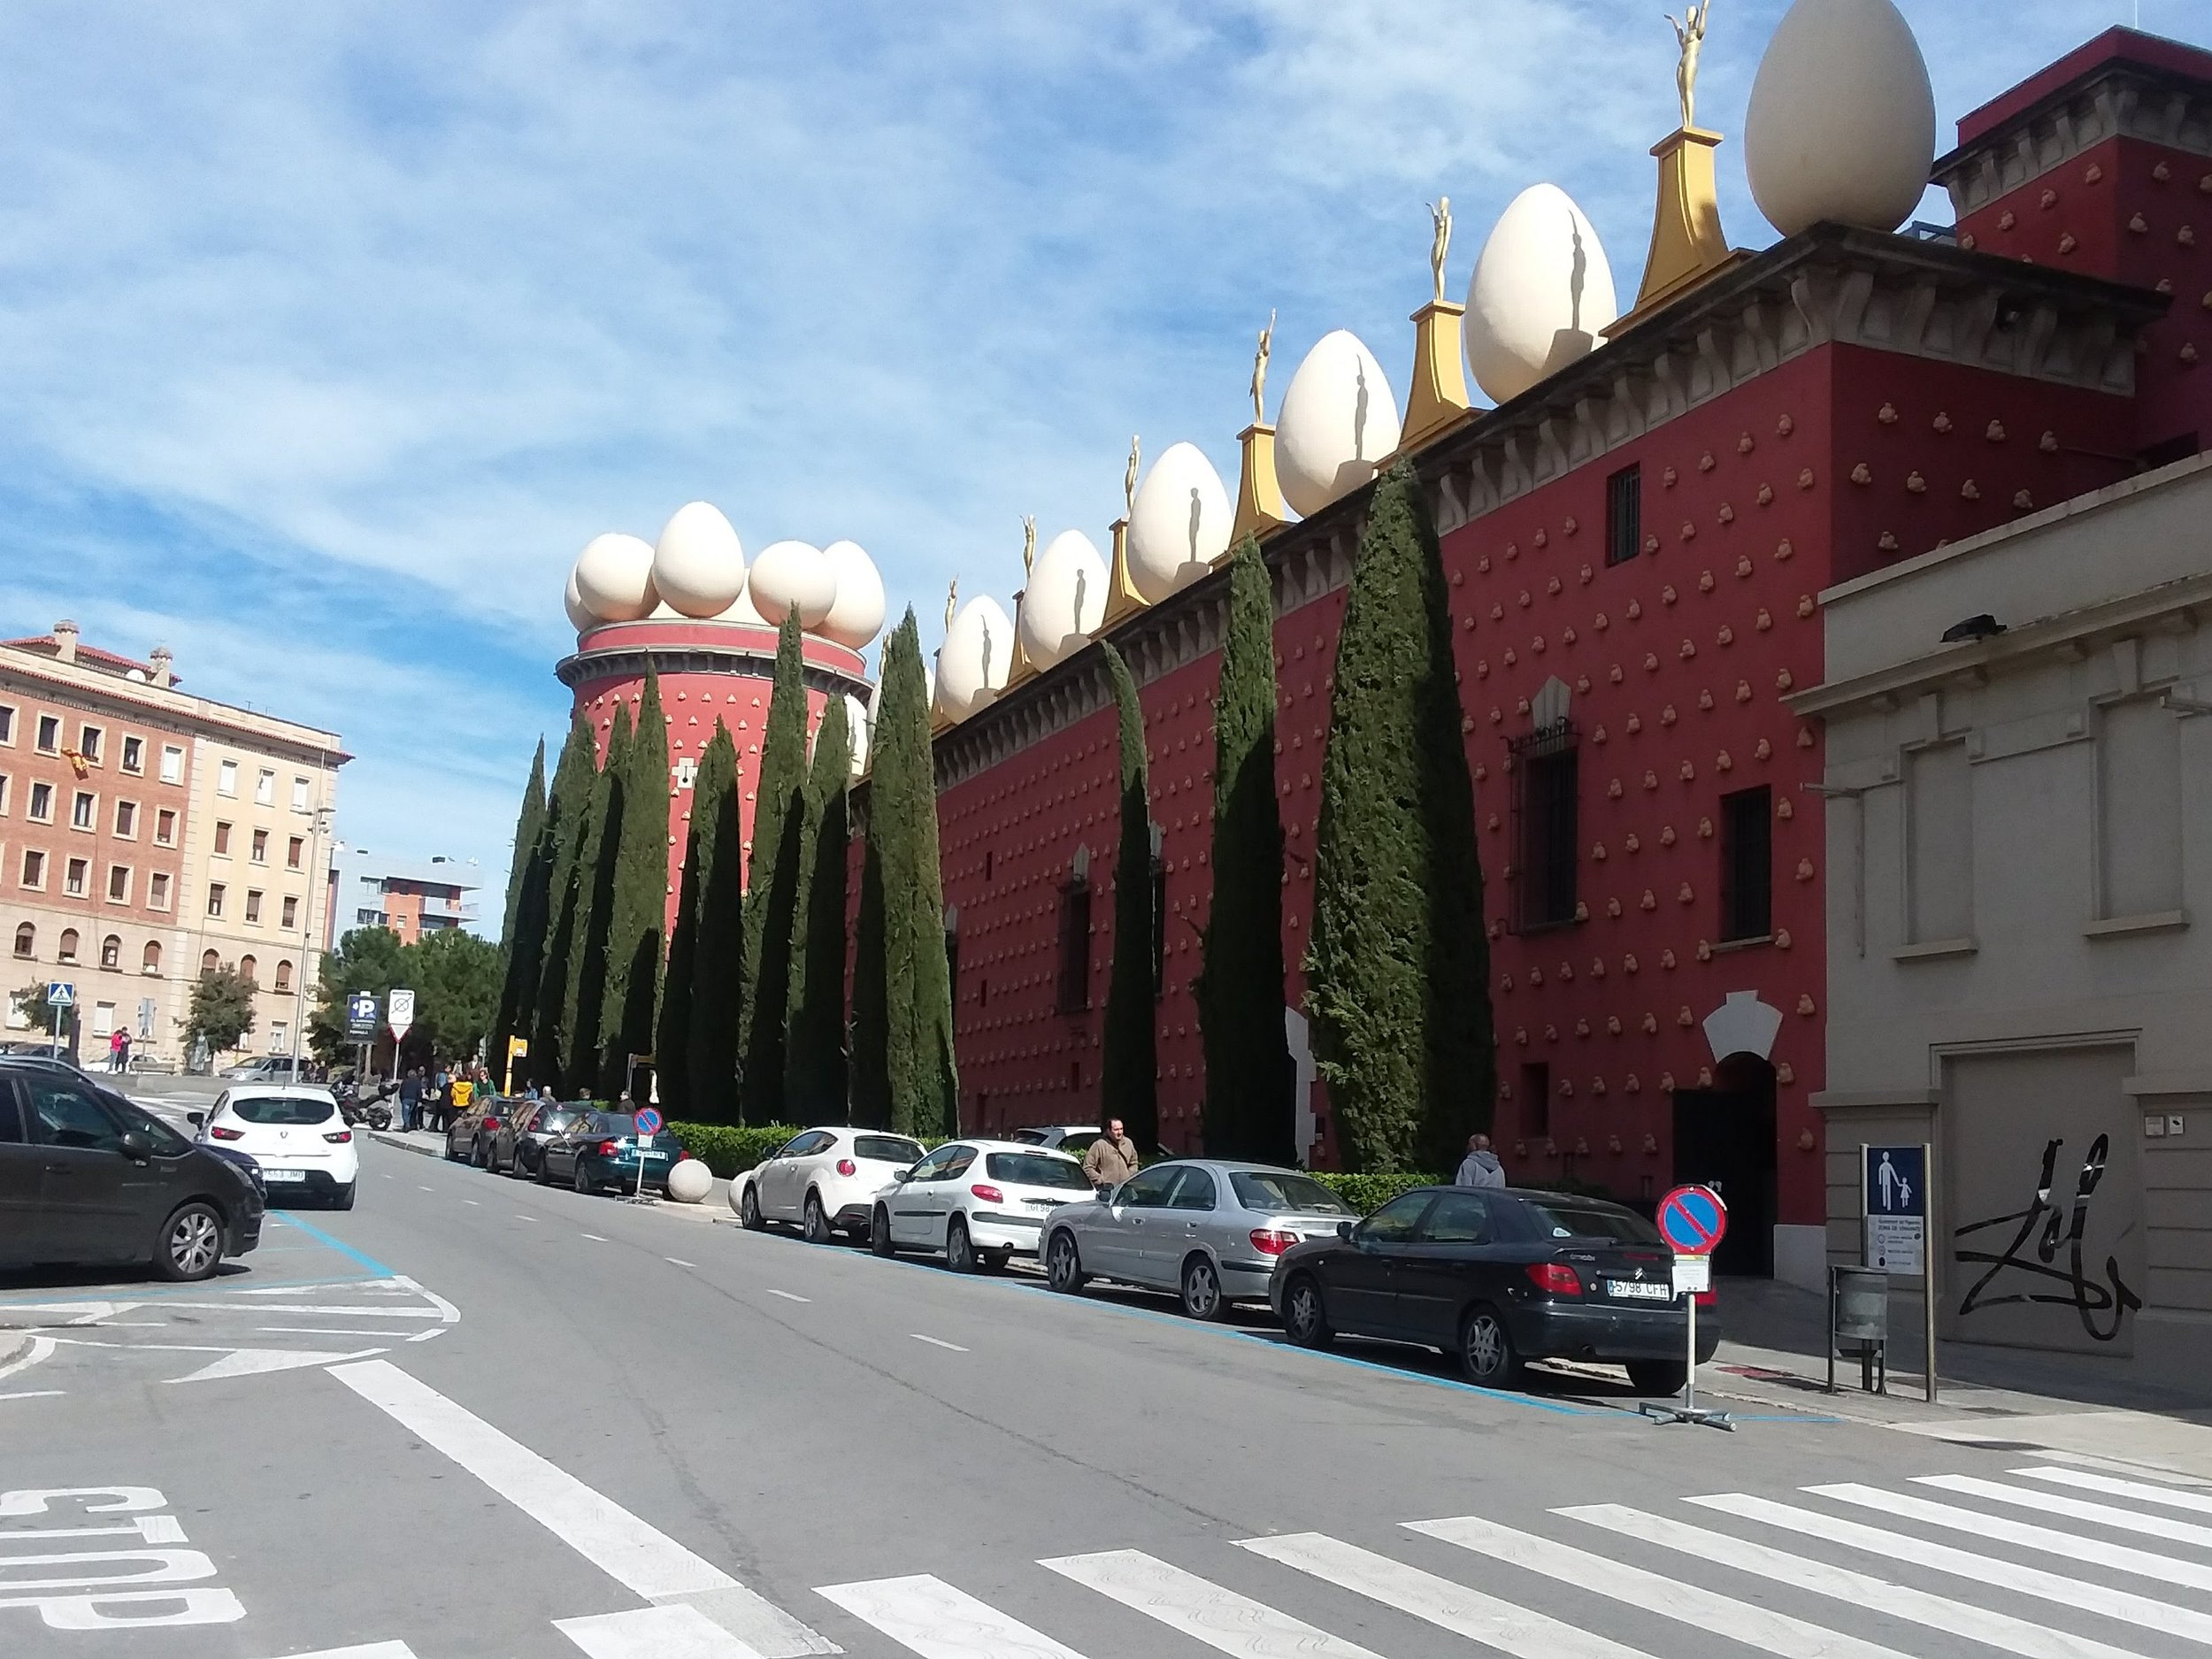 Dali Theatre and Museum Figueres Salvador Dalí  in Costa Brava Spain